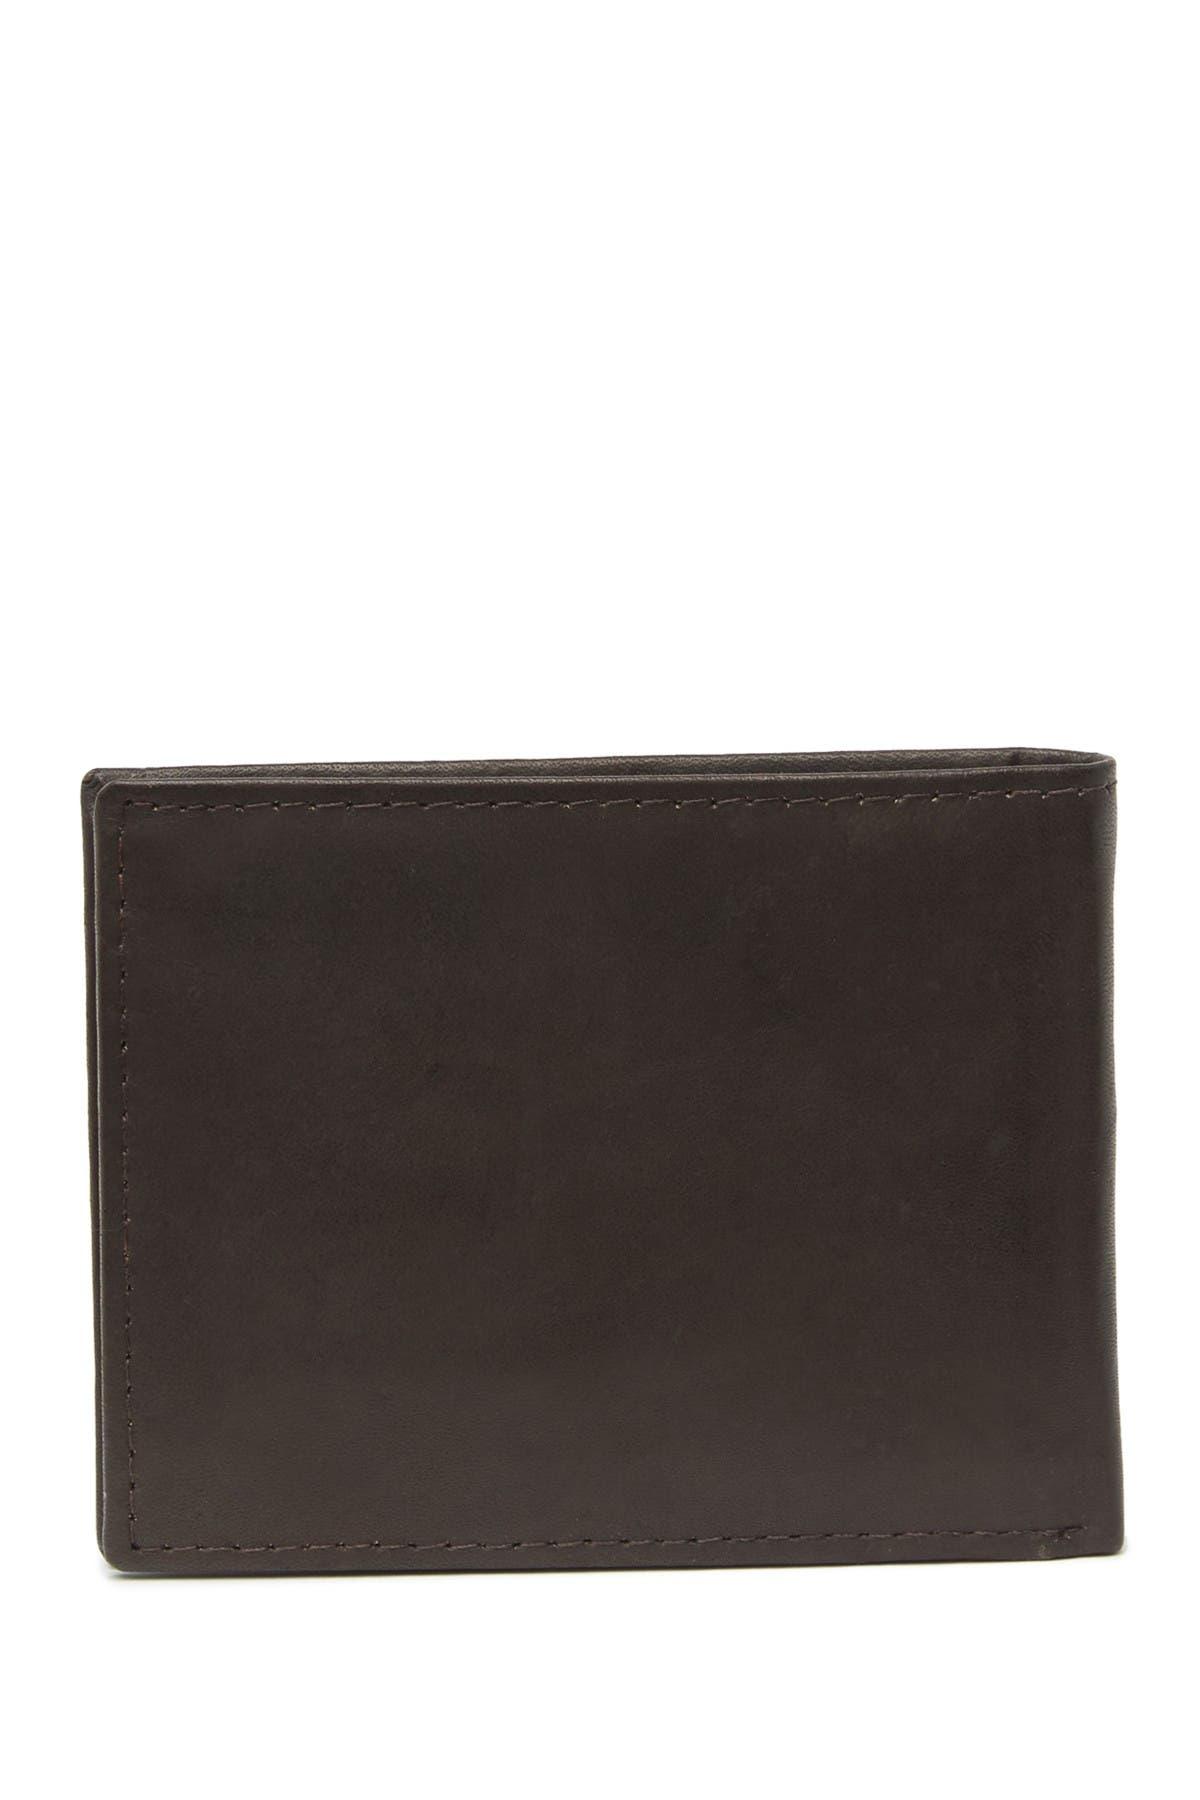 Image of Tahari Leather Key Fob & Bifold Wallet Set